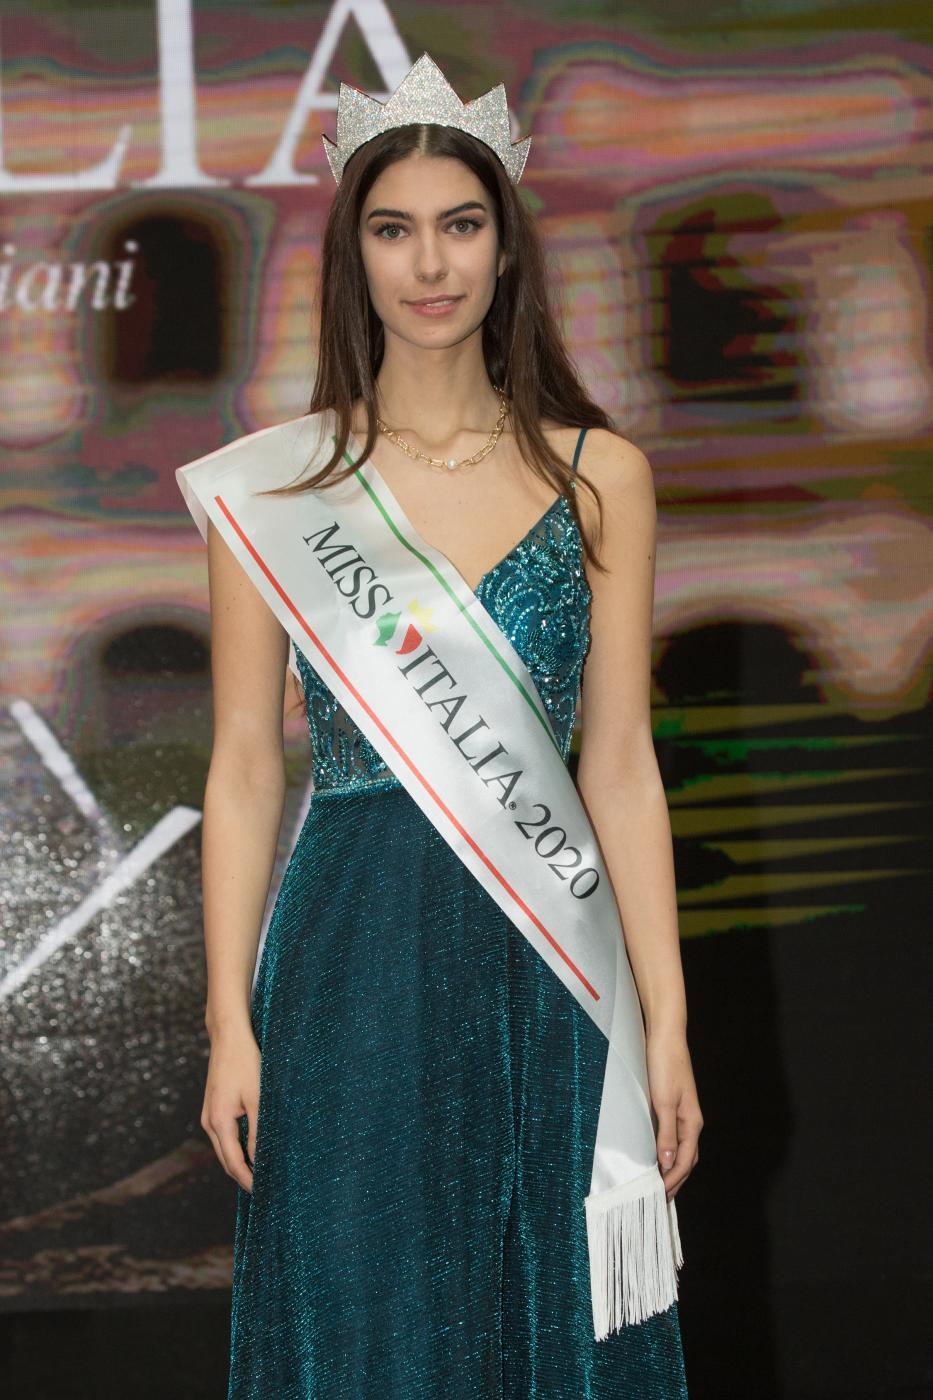 Miss Italia 2020 , la vincitrice è Martina Sambucini